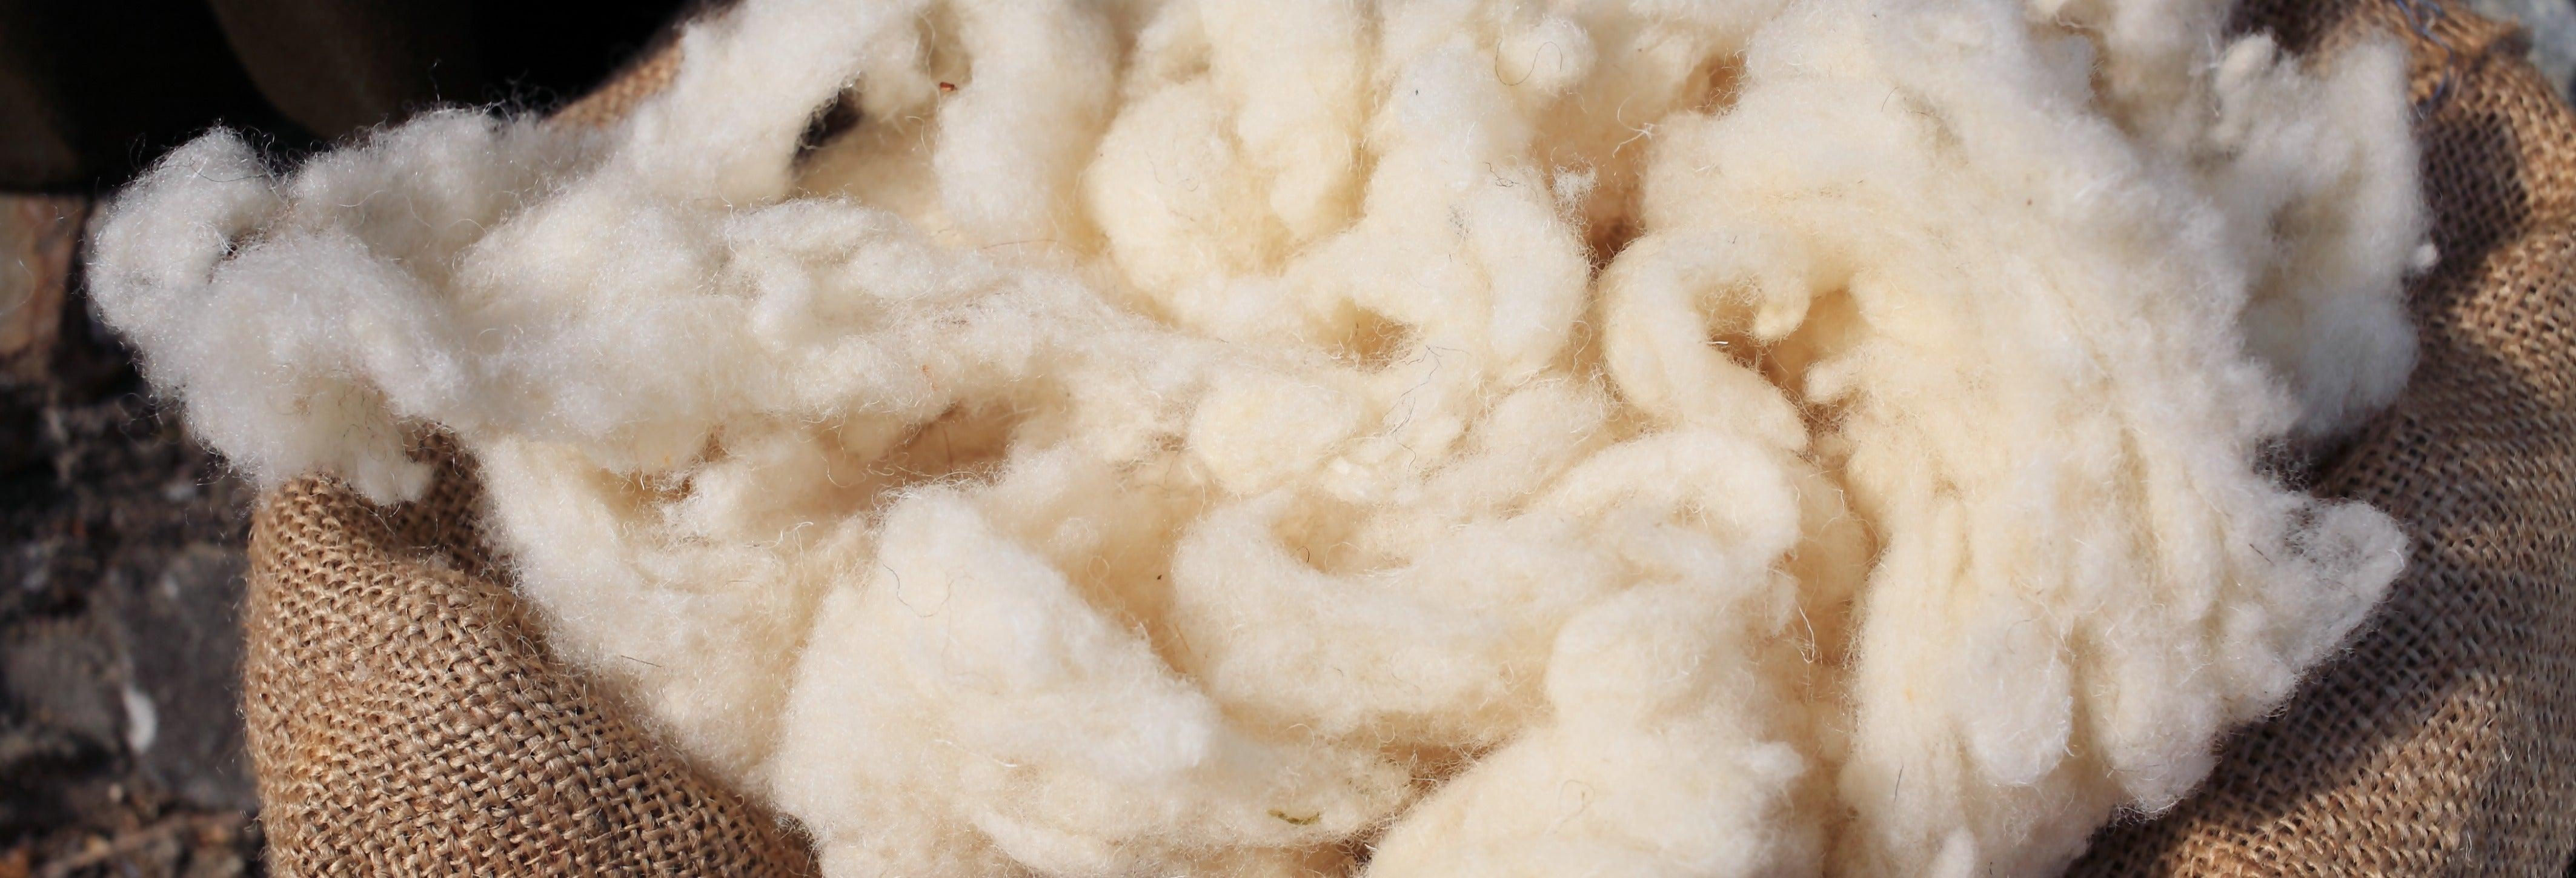 Atelier de laine + Valle Escondido